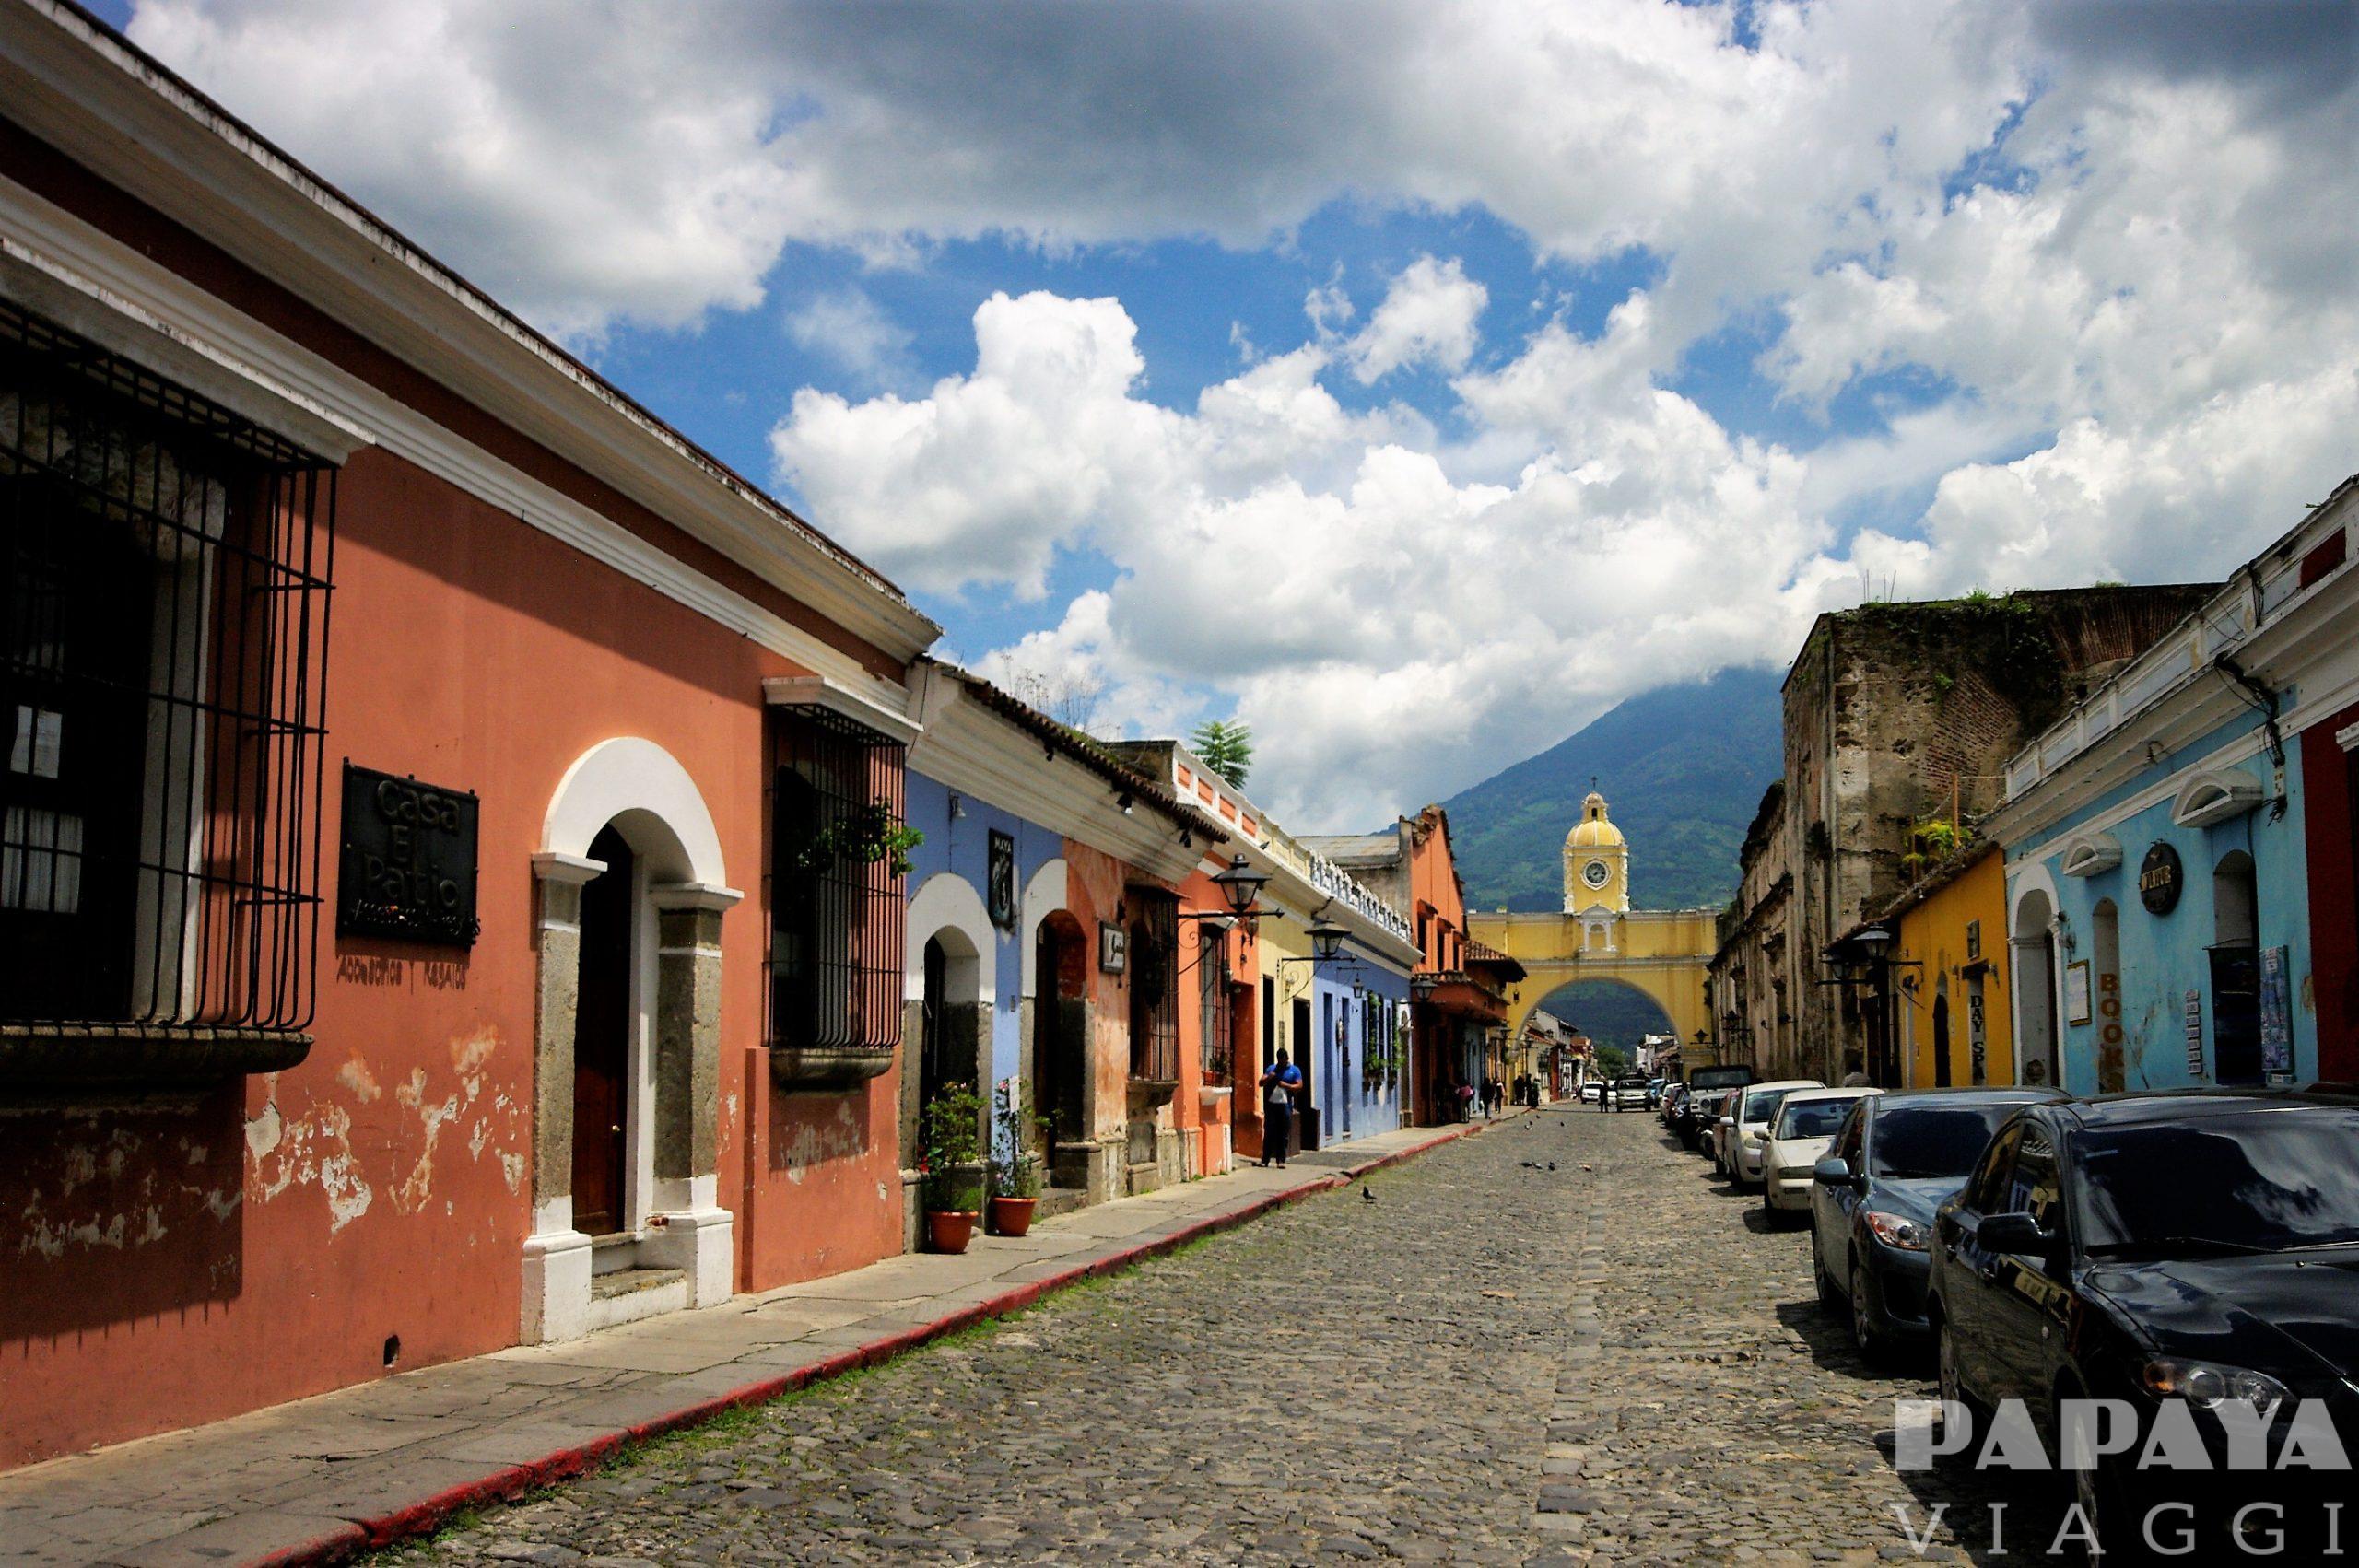 Guatemala e Belize, dai siti Maya alle spiagge dei Caraibi